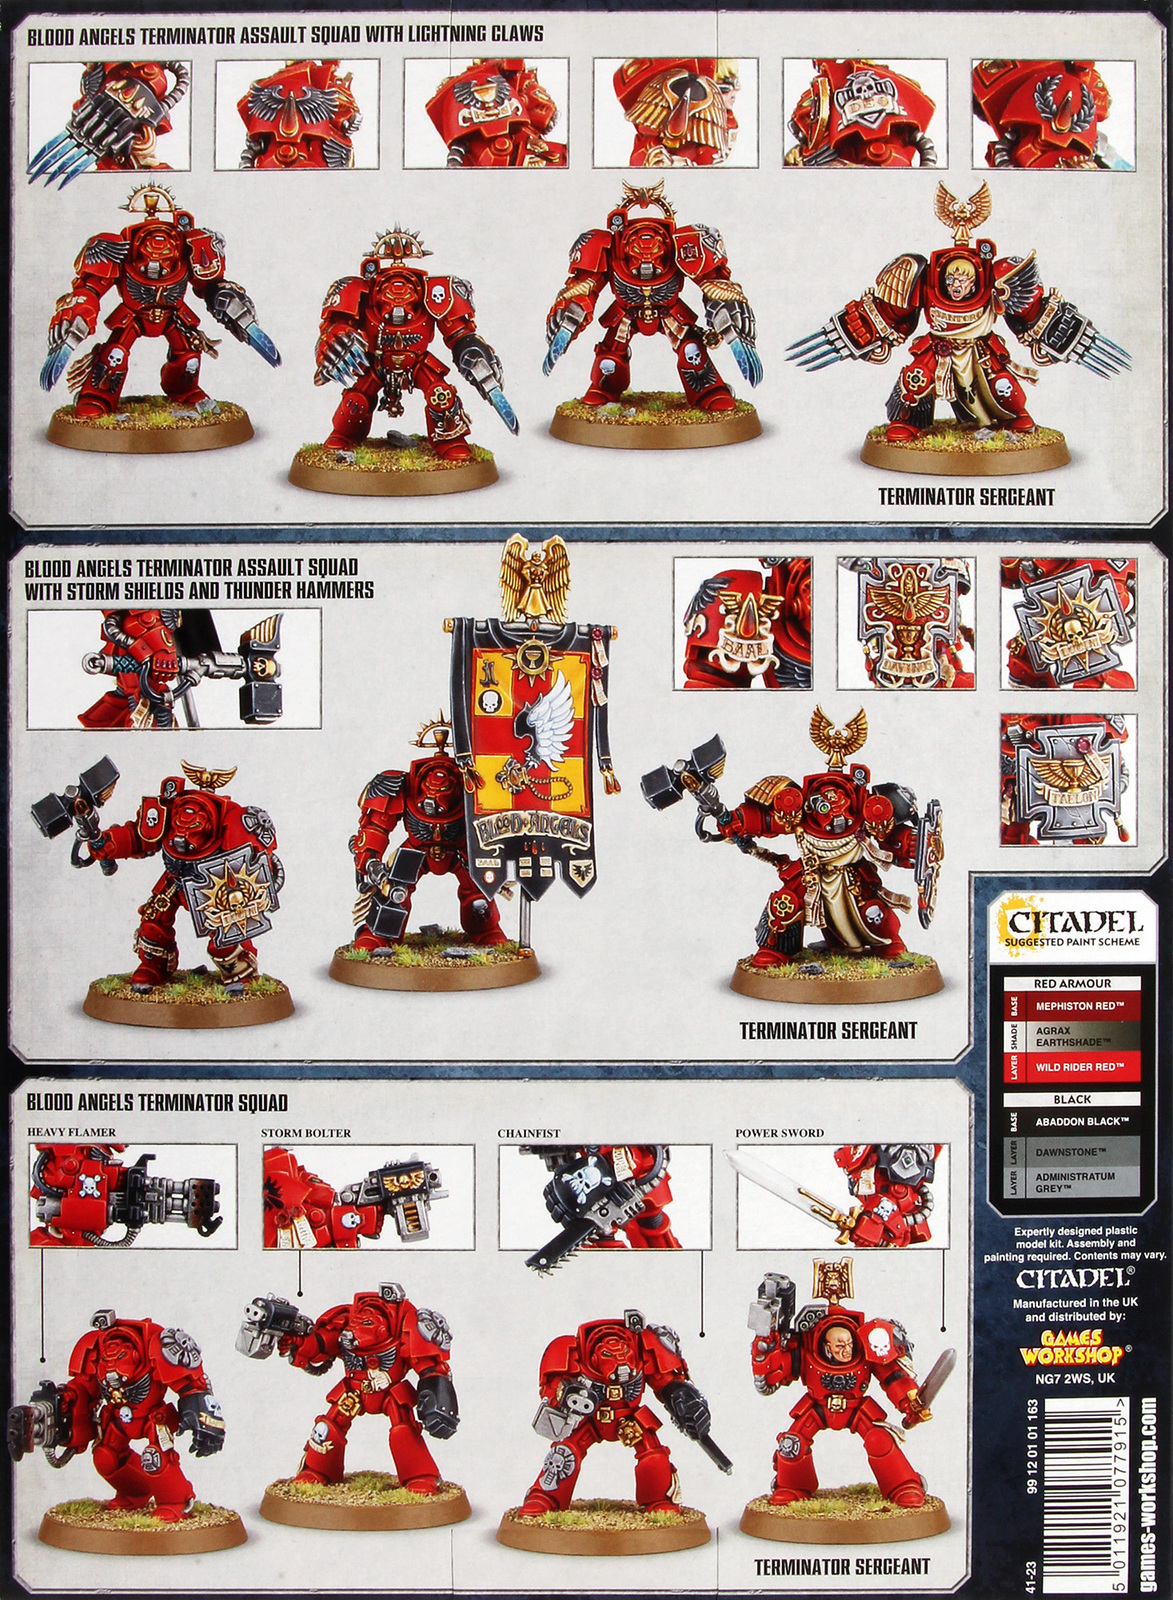 Warhammer 40,000 Blood Angels Archangels Orbital Intervention Force image